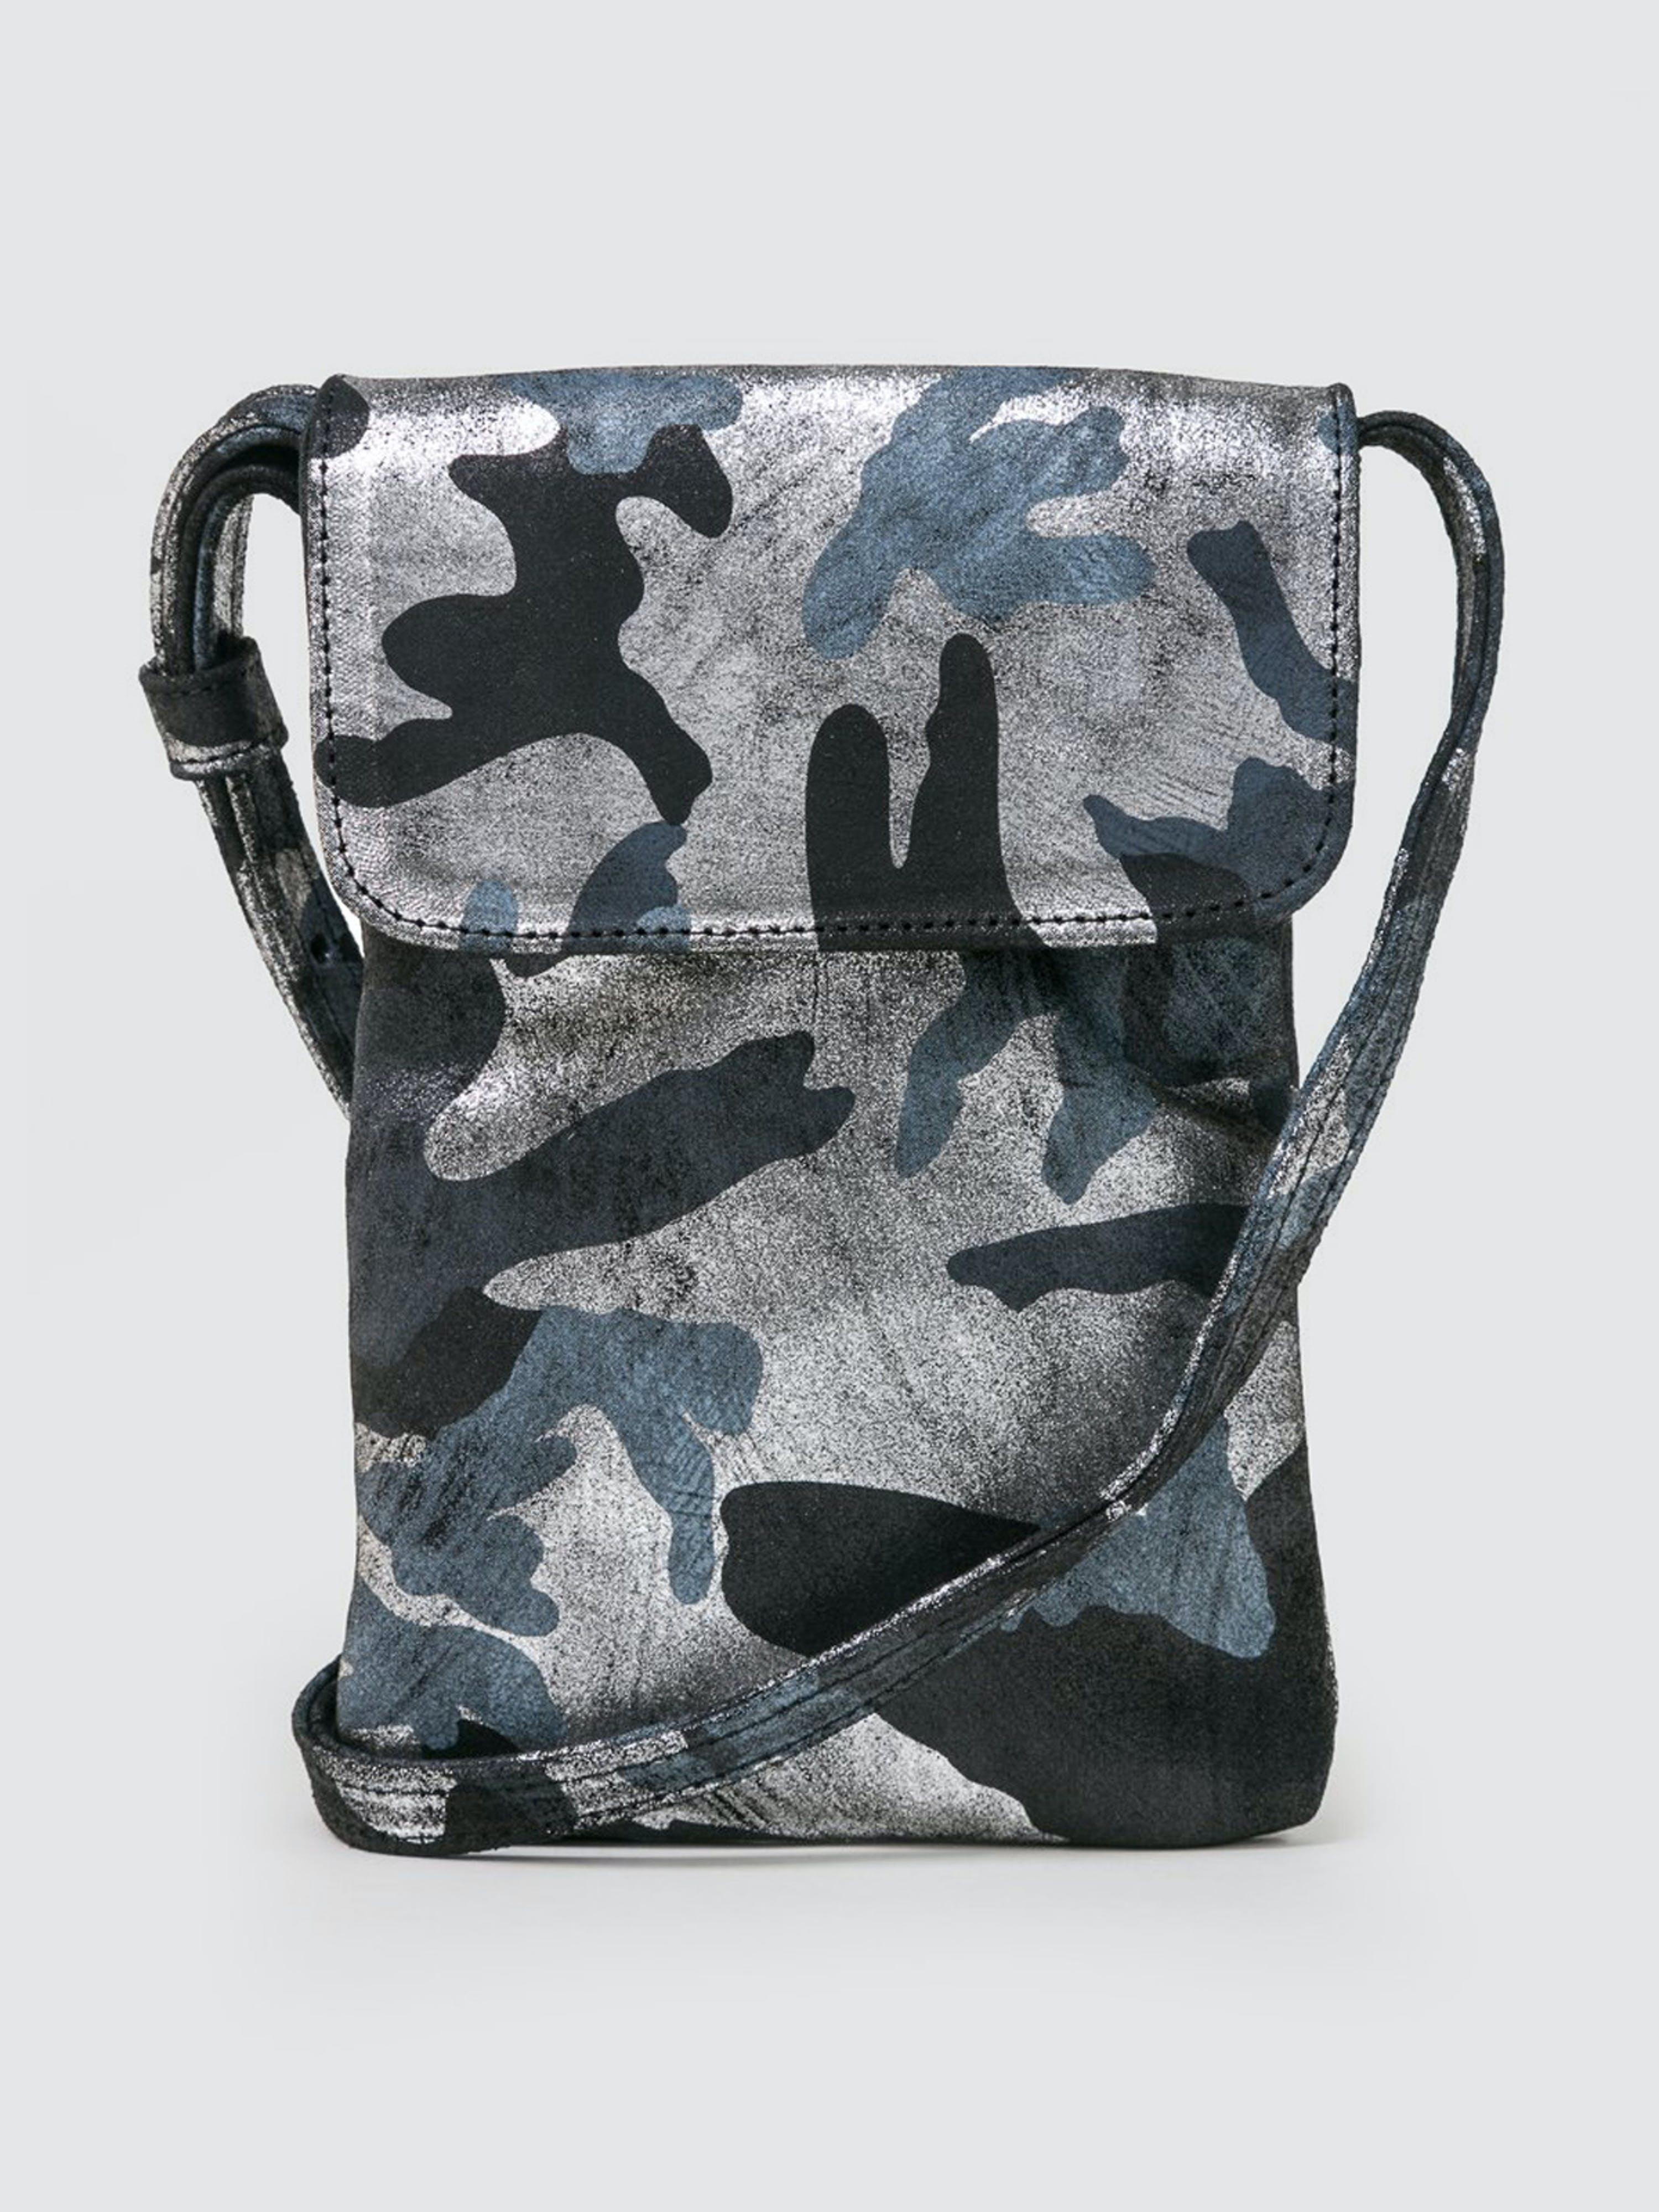 CoFi Leathers Penny Phone Bag: Black Silver Camouflage  - Grey